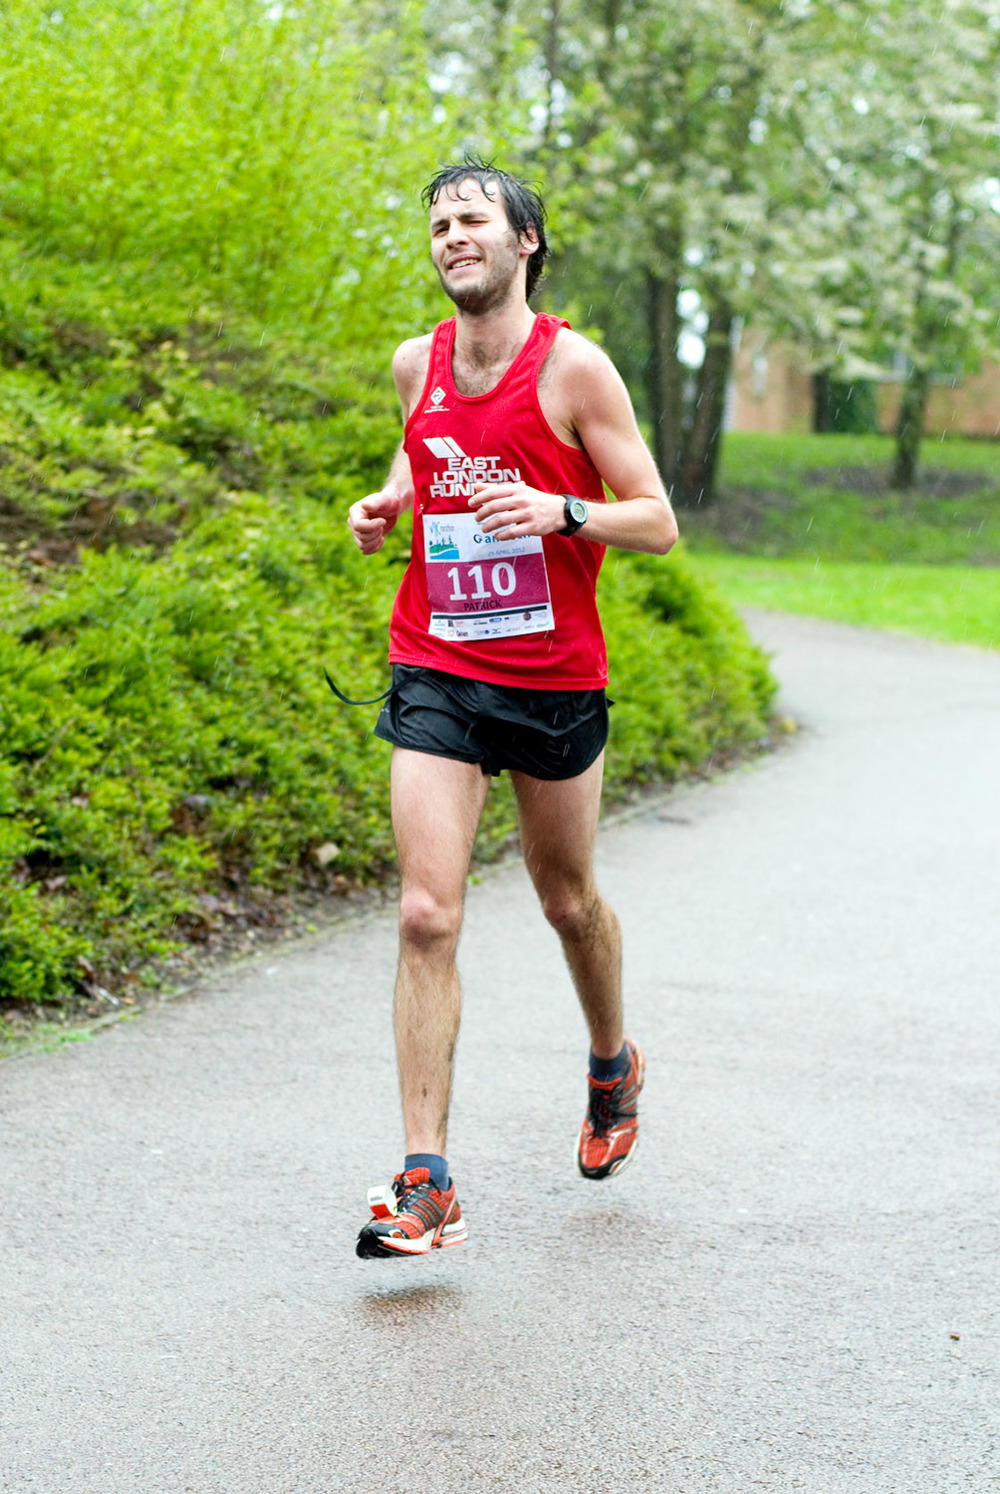 Milton Keynes Marathon 2012 - Mile 24.75